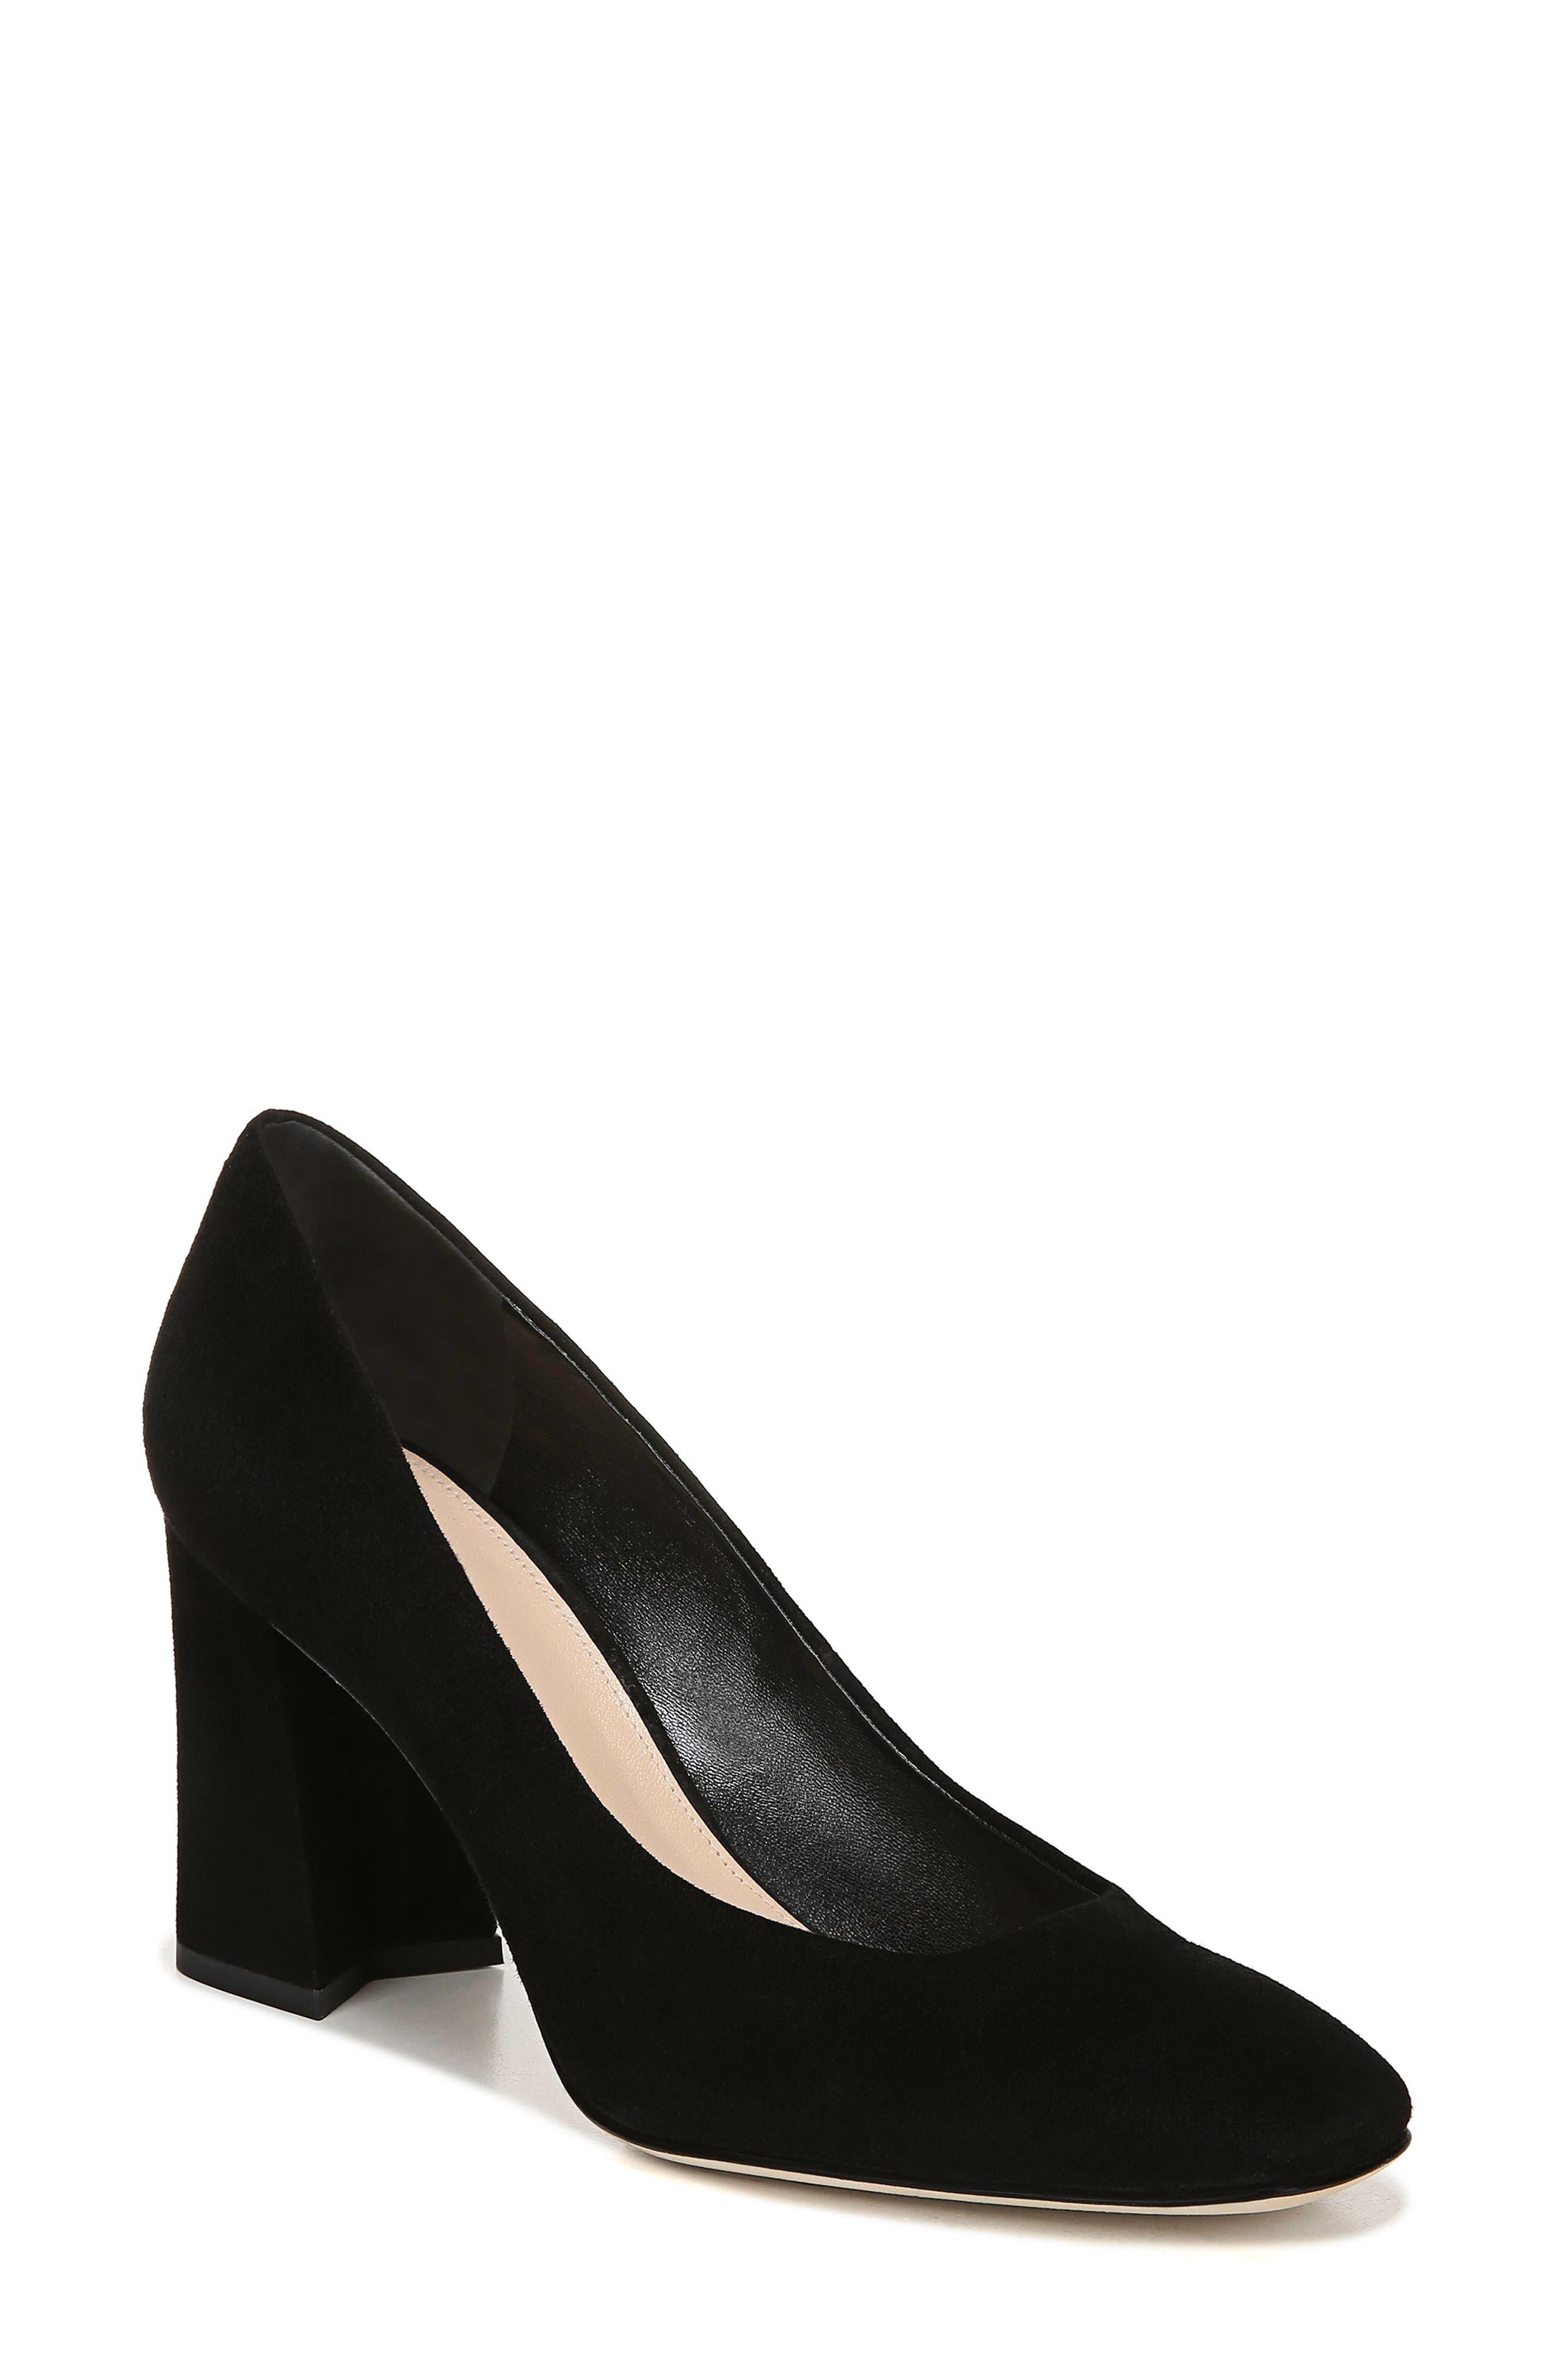 Women's Via Spiga Shoes   Nordstrom